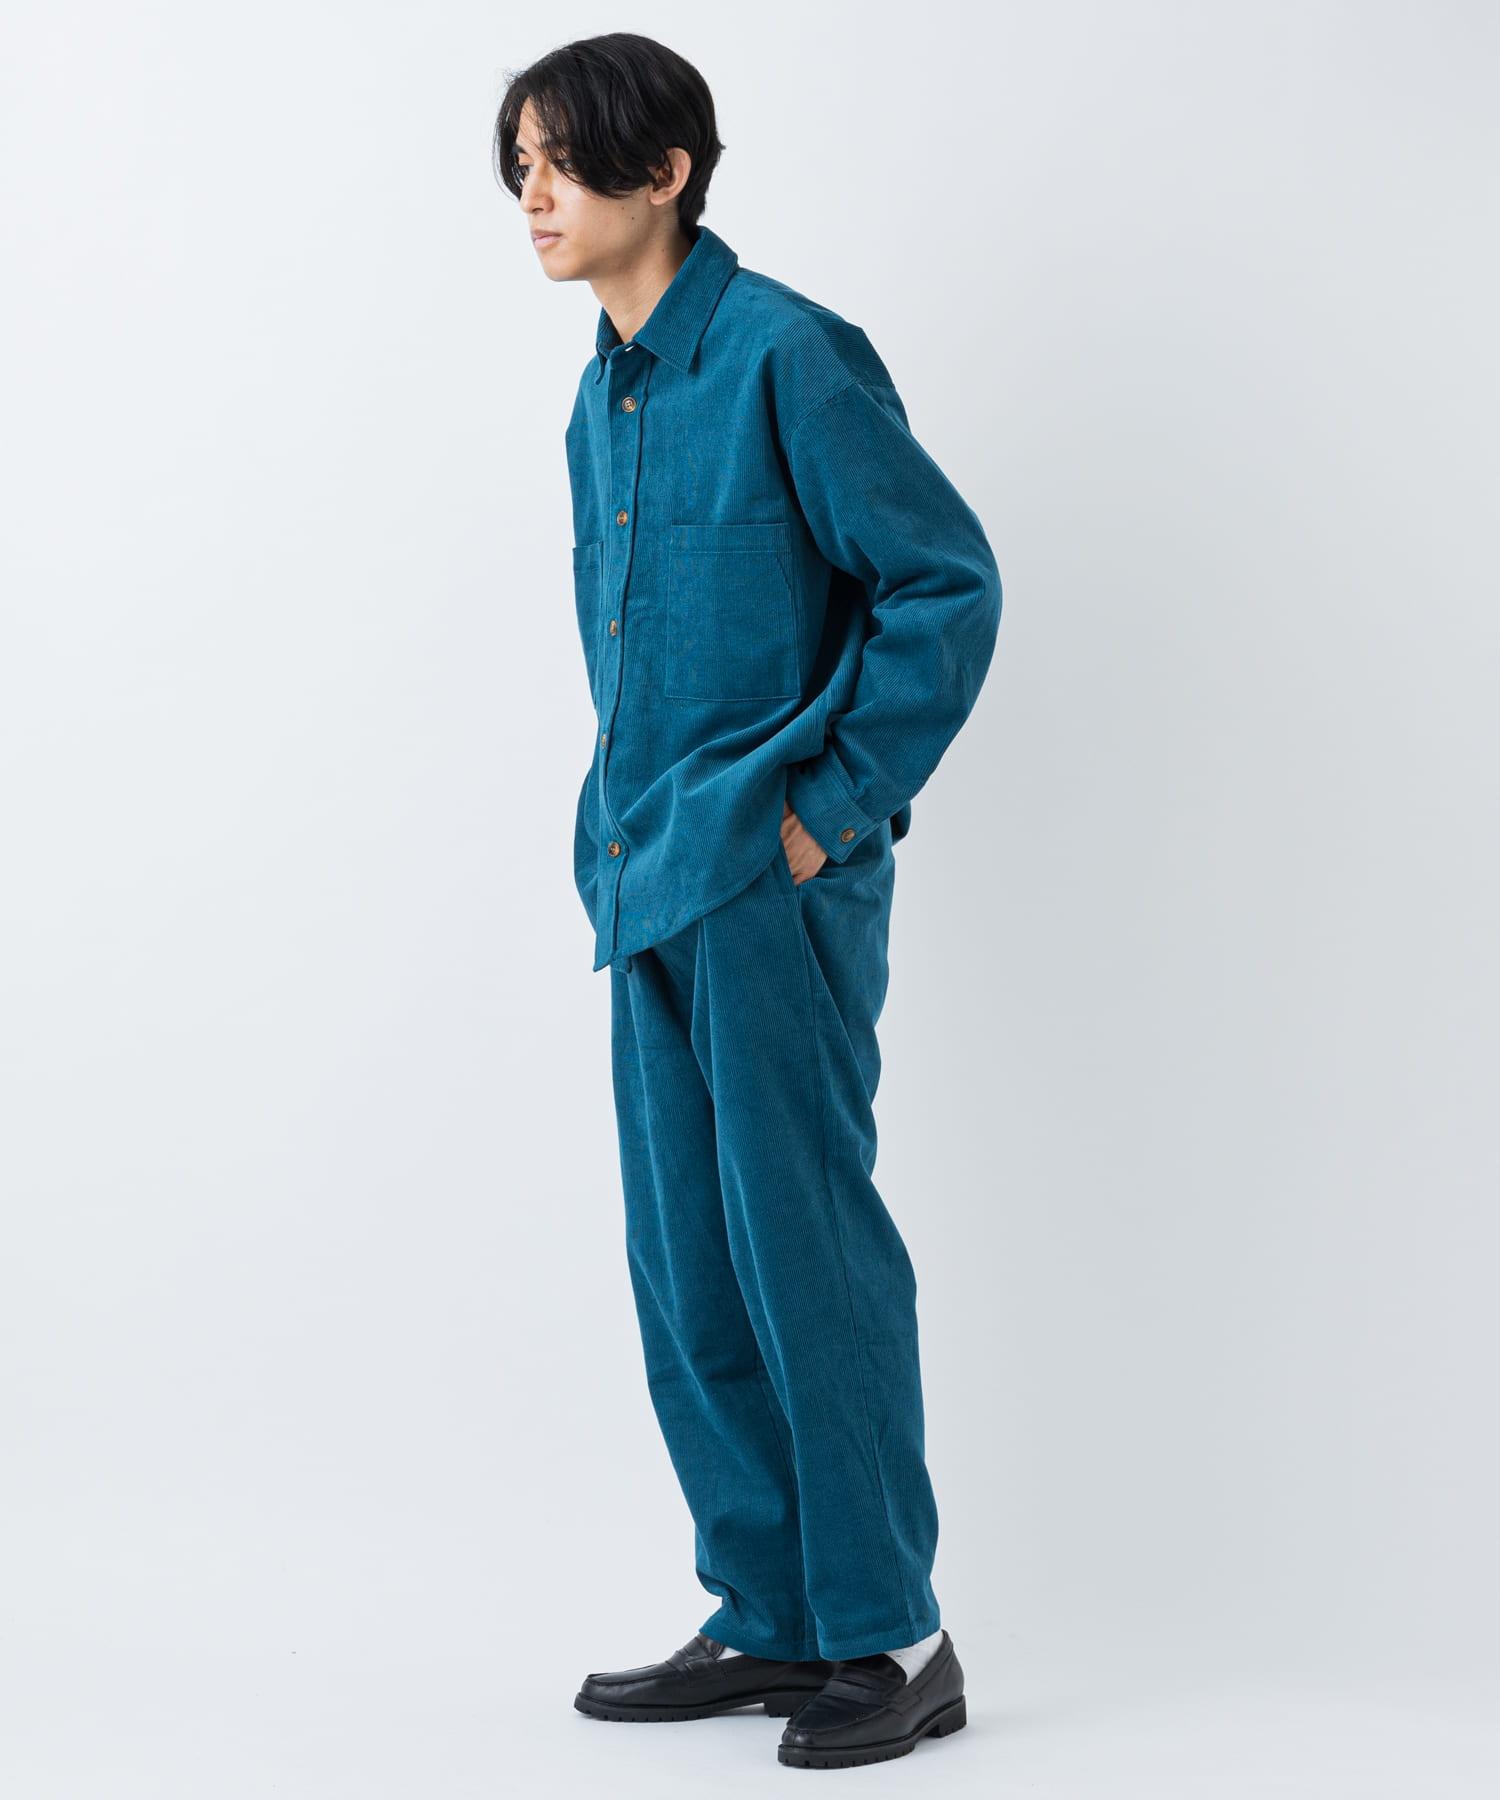 CIAOPANIC(チャオパニック) 【WEB限定】コーデュロイスケートオーバーサイズシャツジャケット